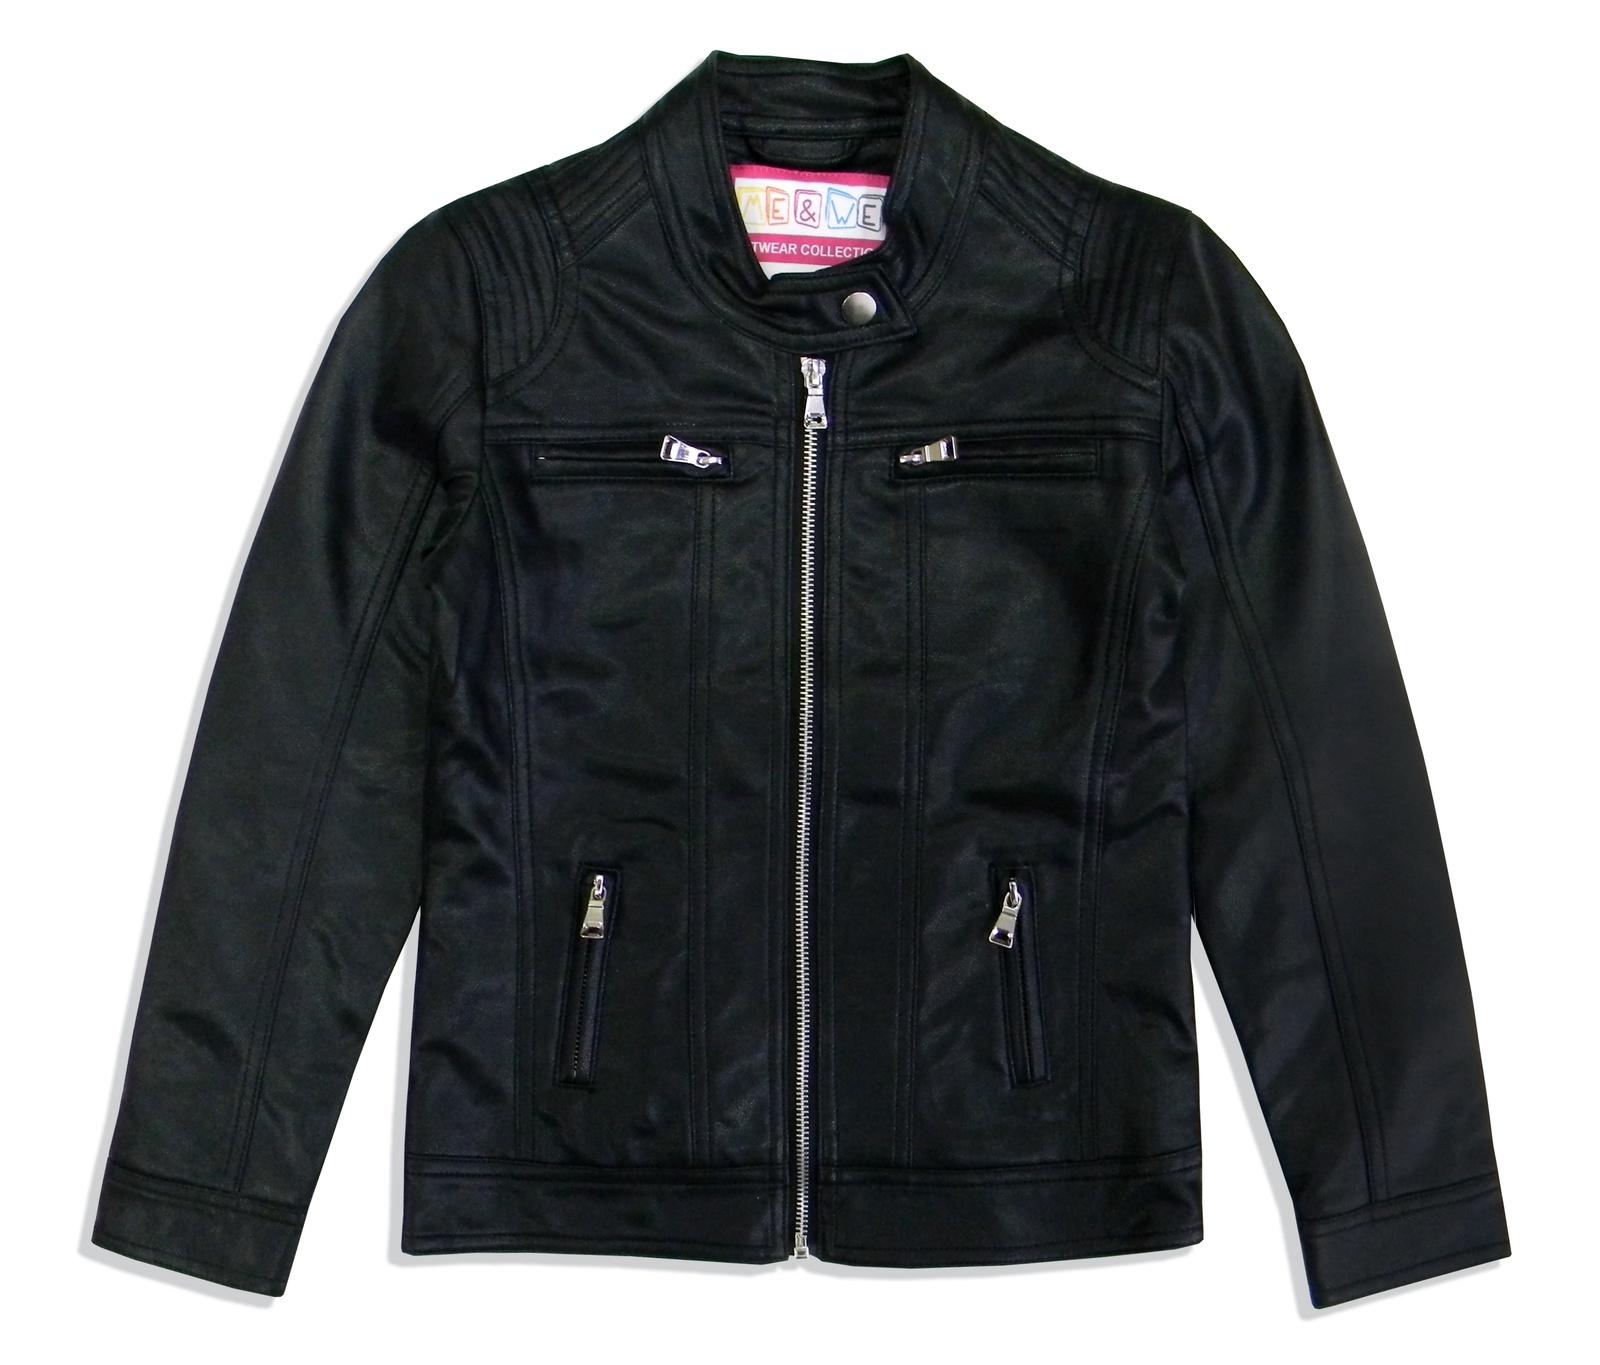 Куртка Me&We куртка для девочки batik габриэль цвет хаки 121 19з размер 152